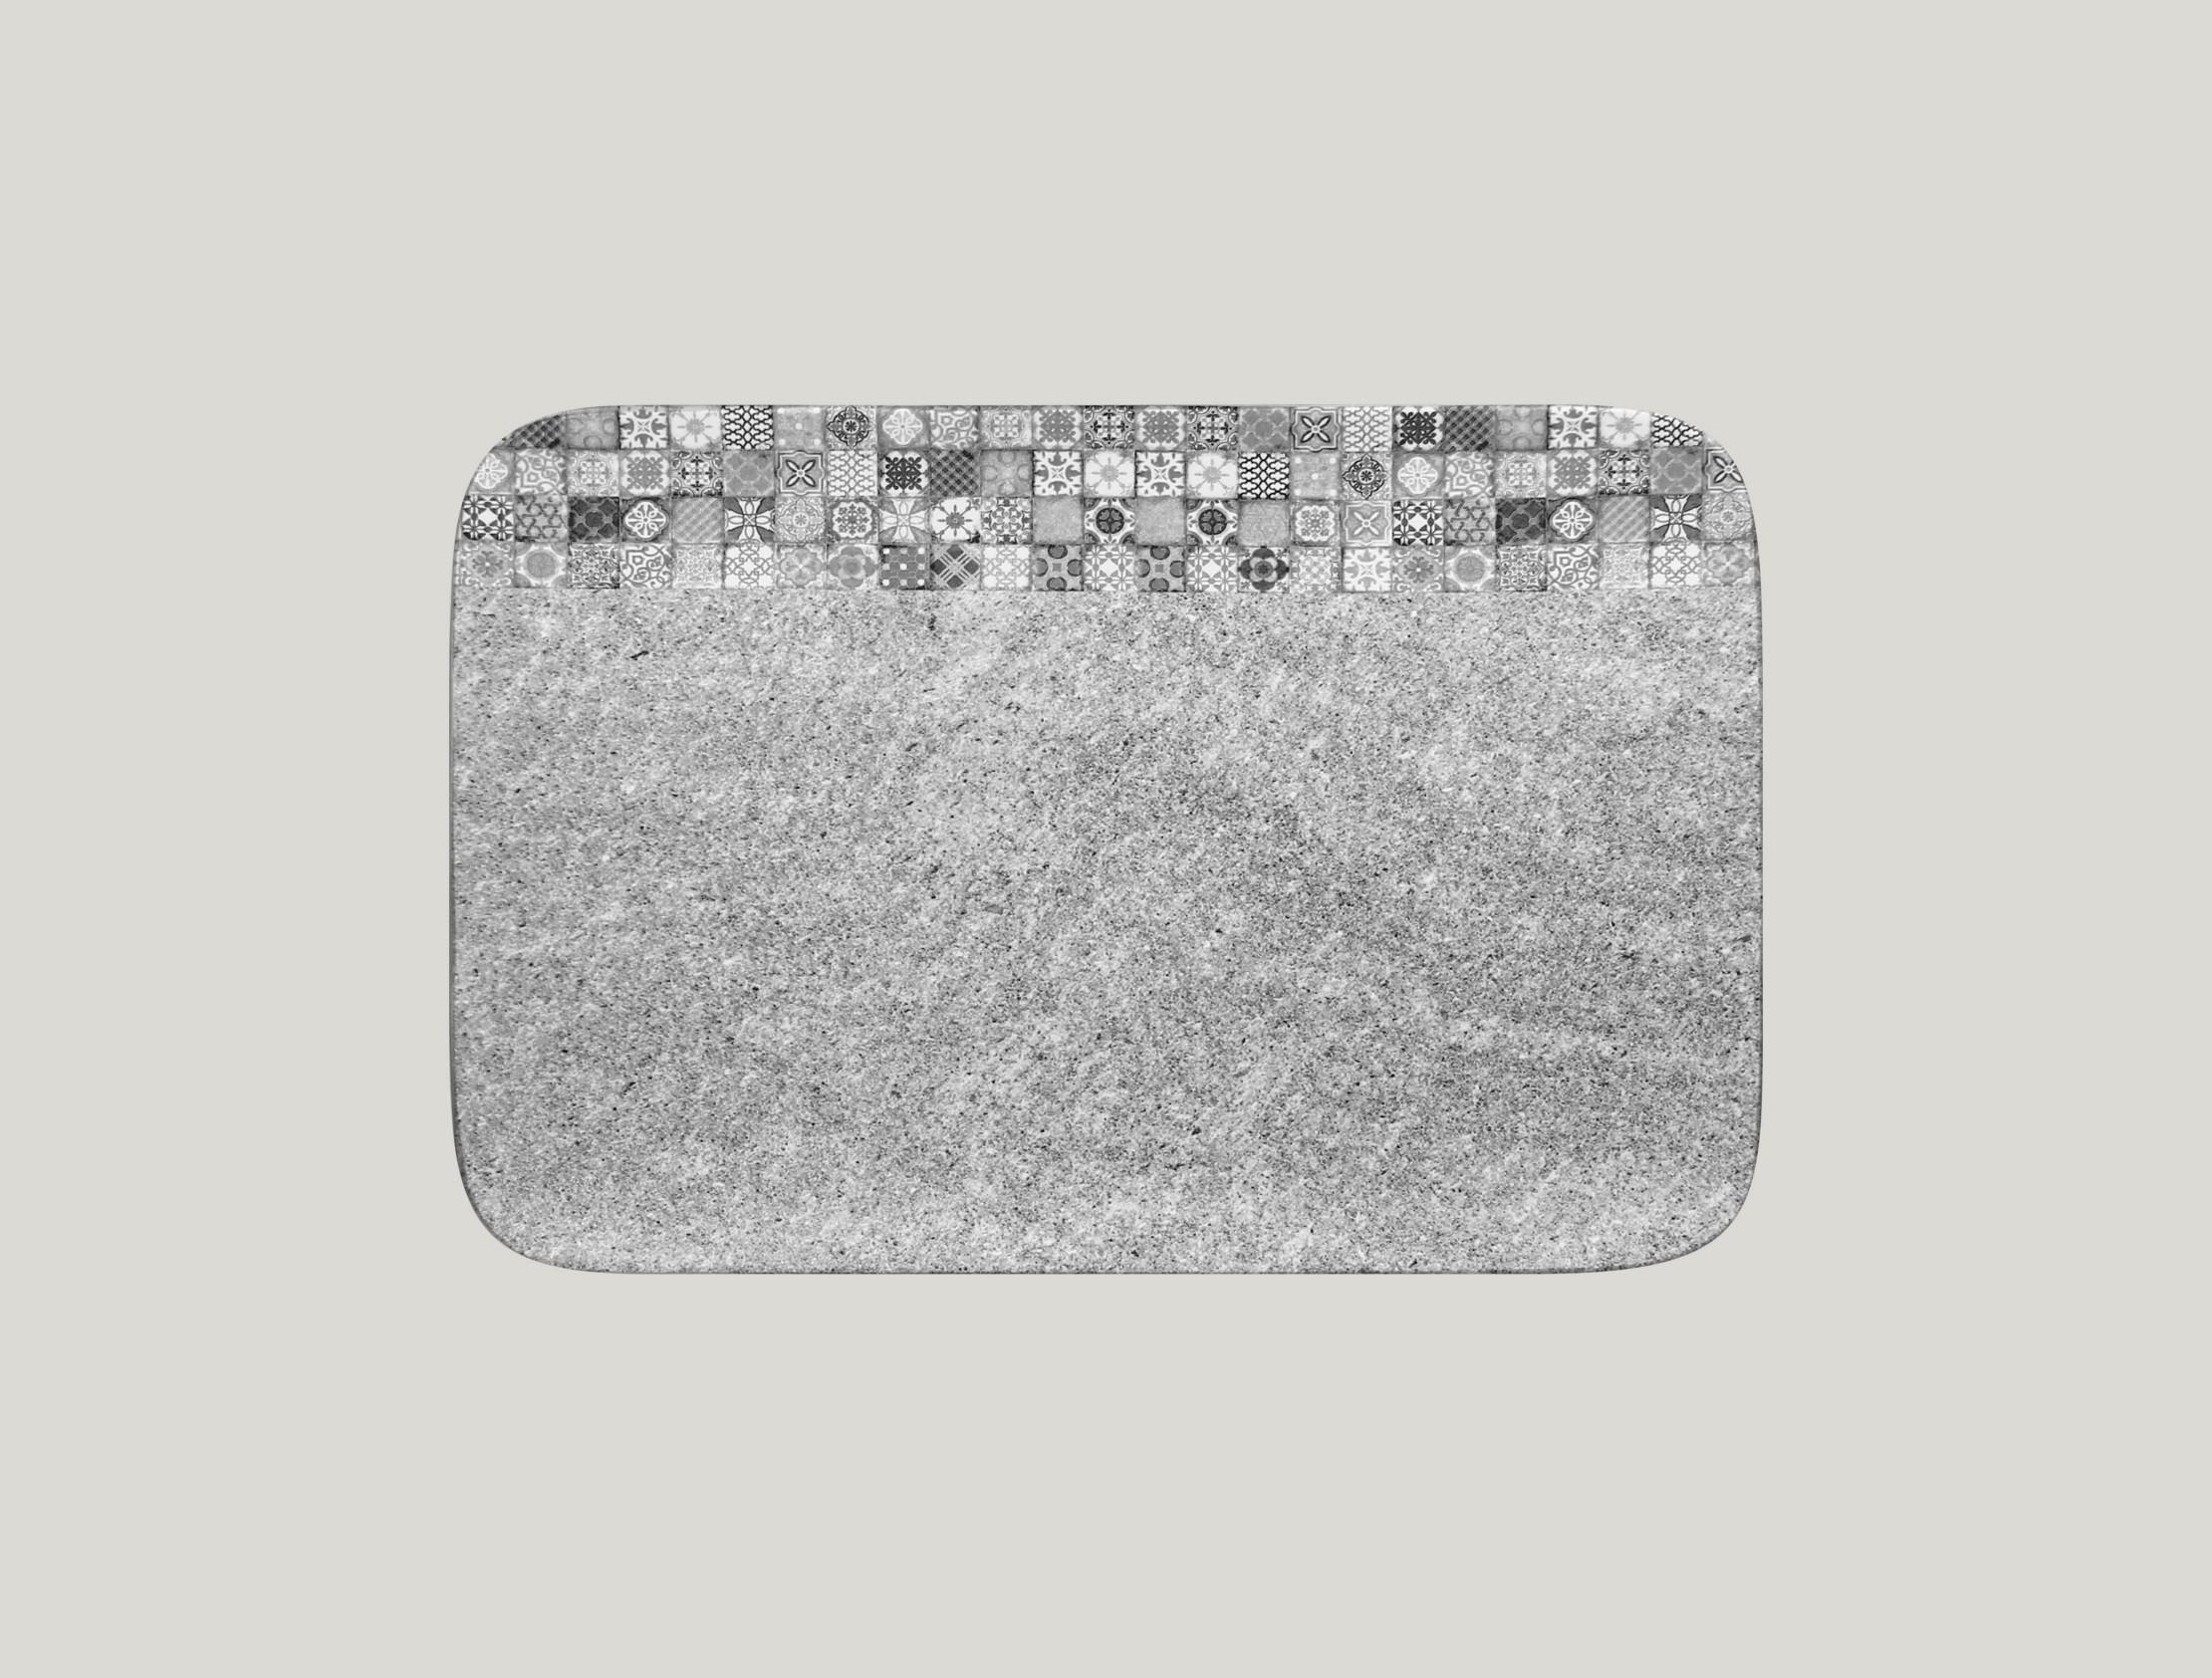 Talíř obdélníkový 33 x 22 cm - šedá